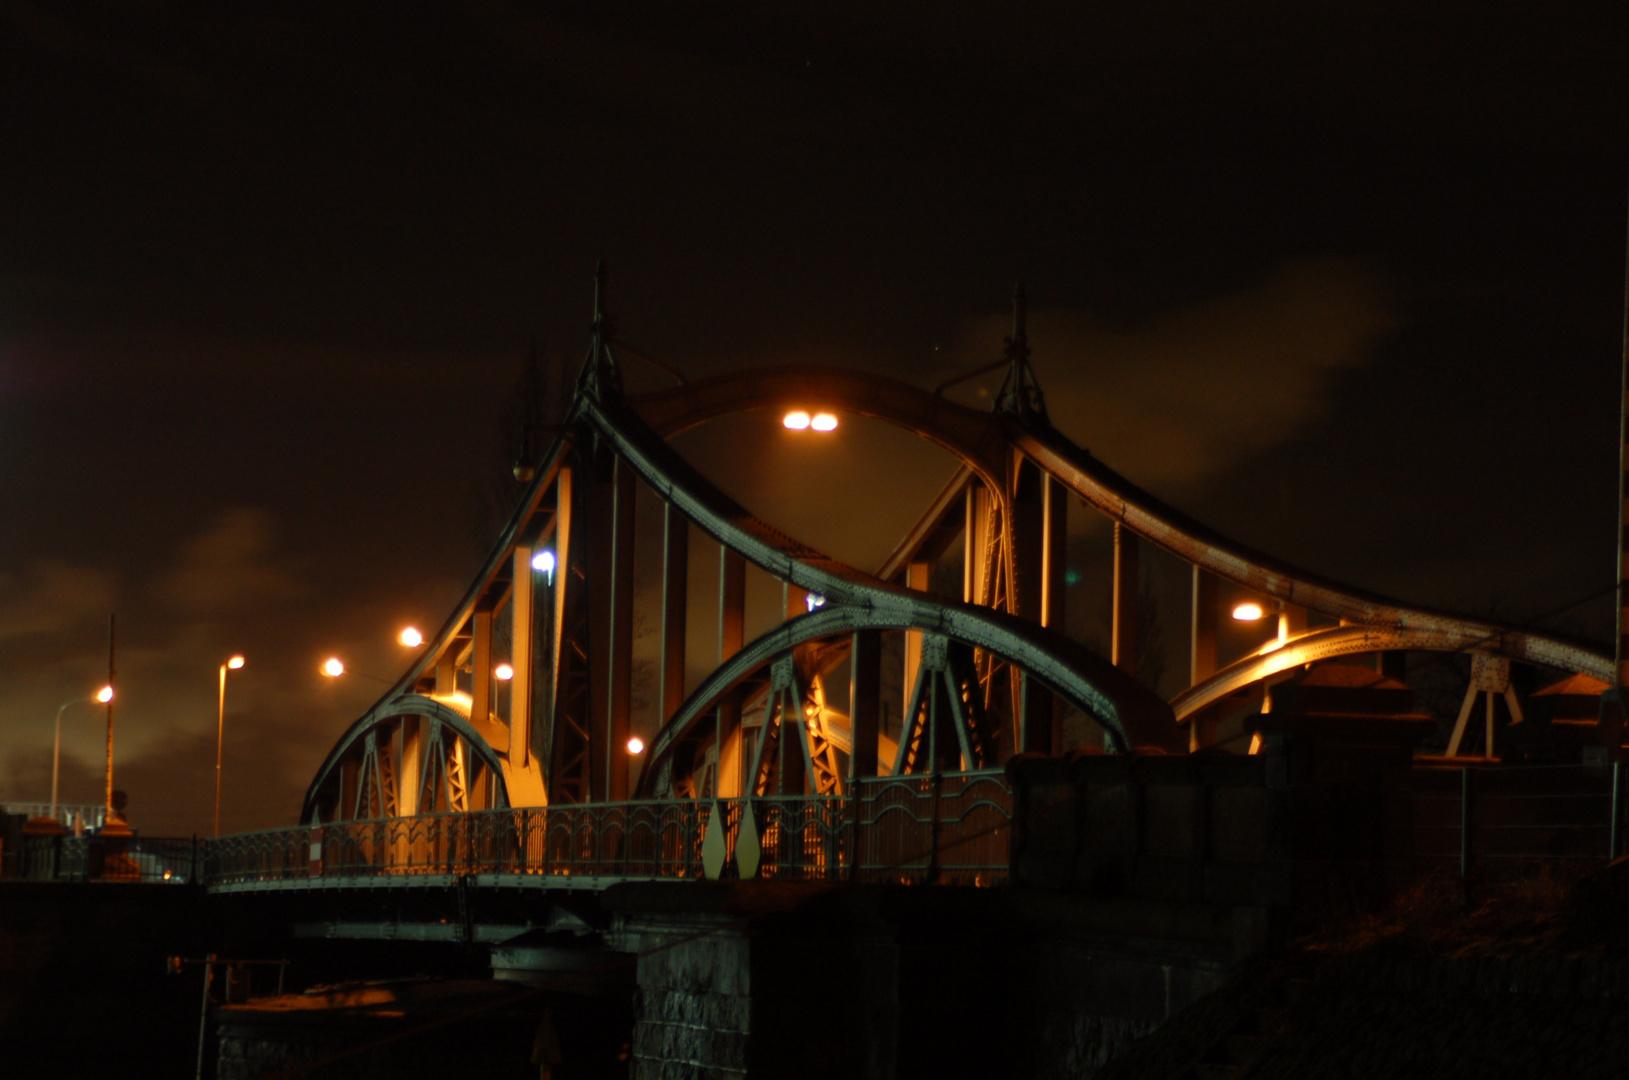 Rheinhafen Drehbrücke